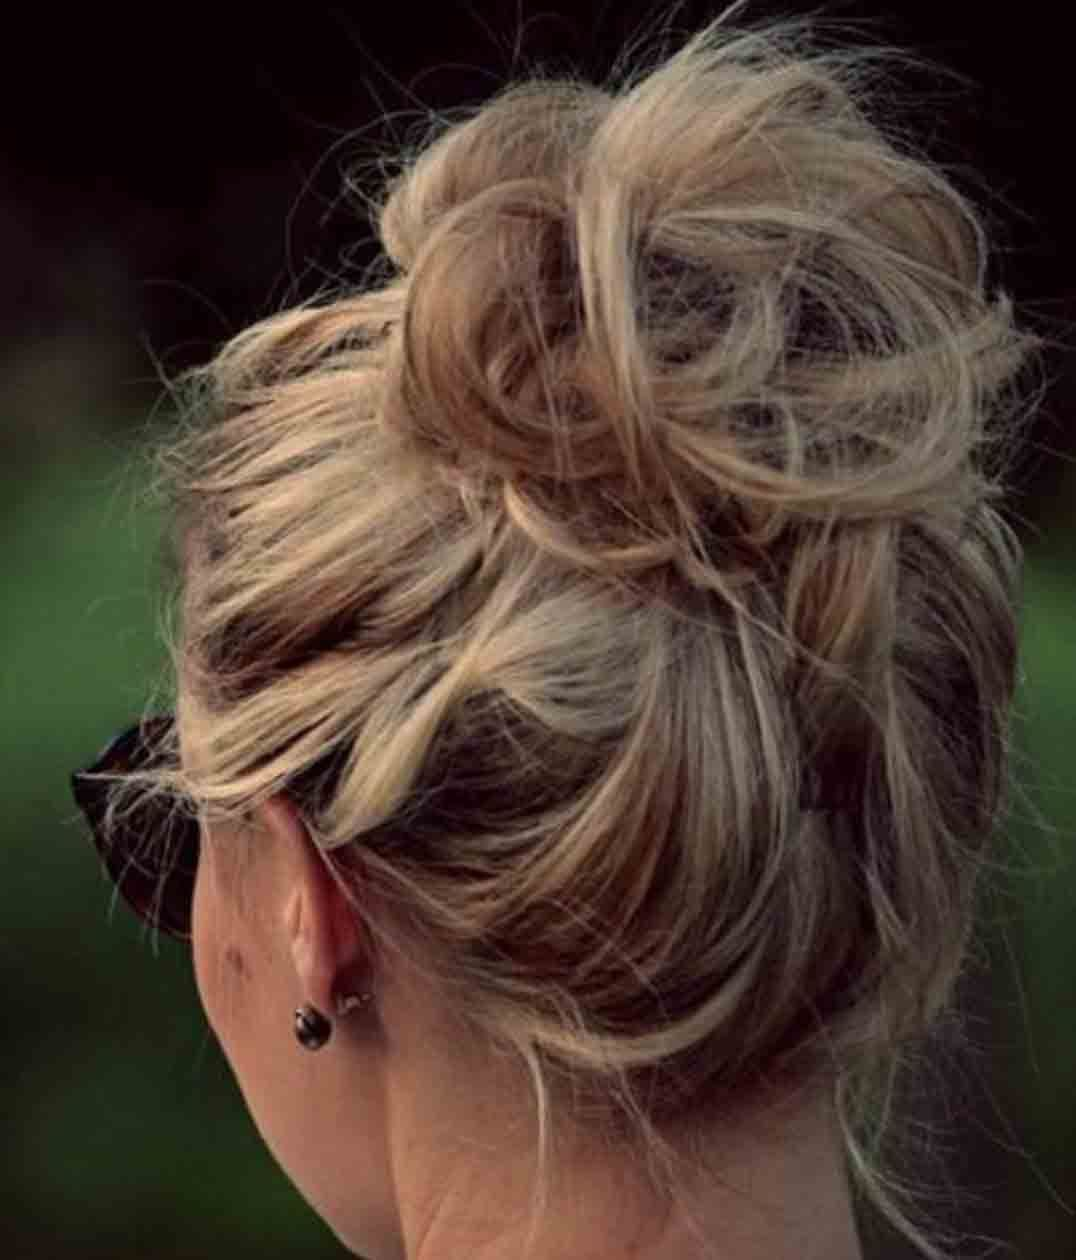 lang haar opsteken